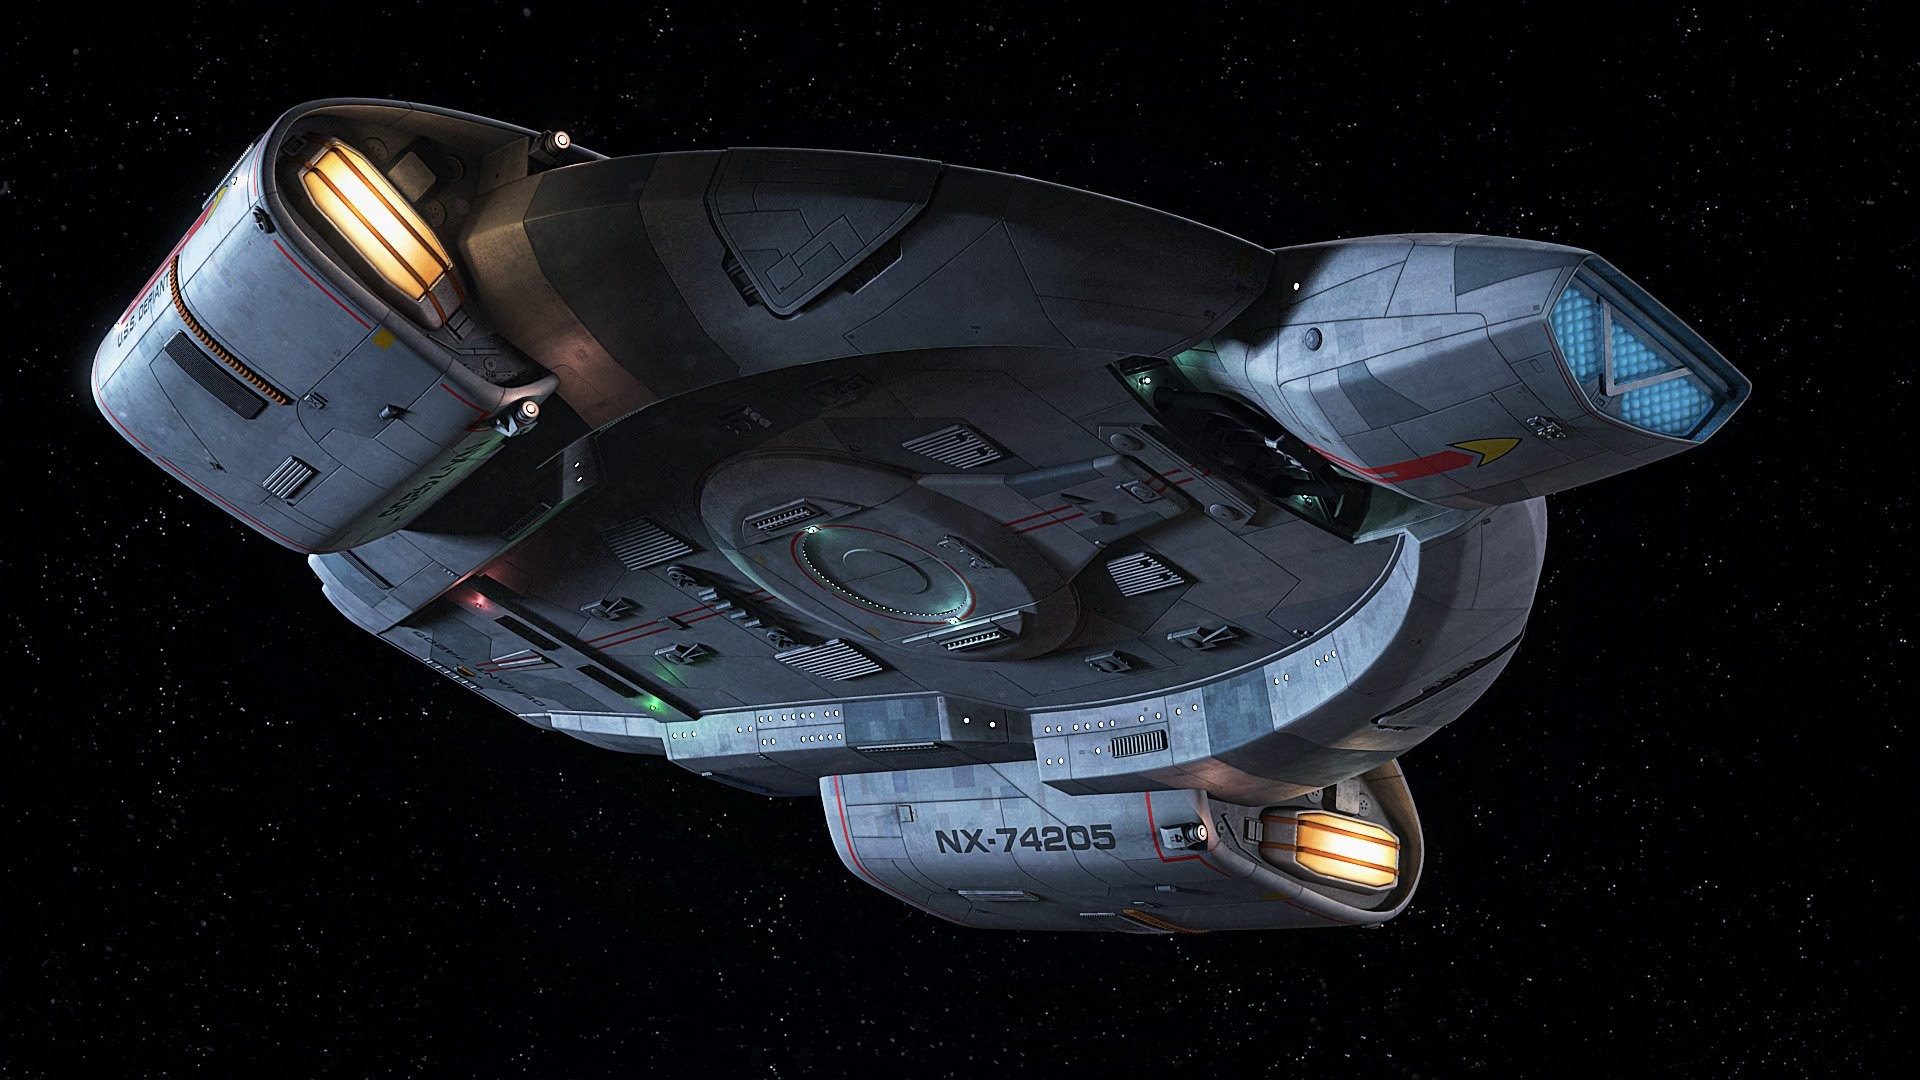 Pin by Guy, Robot on Space Tattoo – USS Defiant   Pinterest   Star trek and  Trek